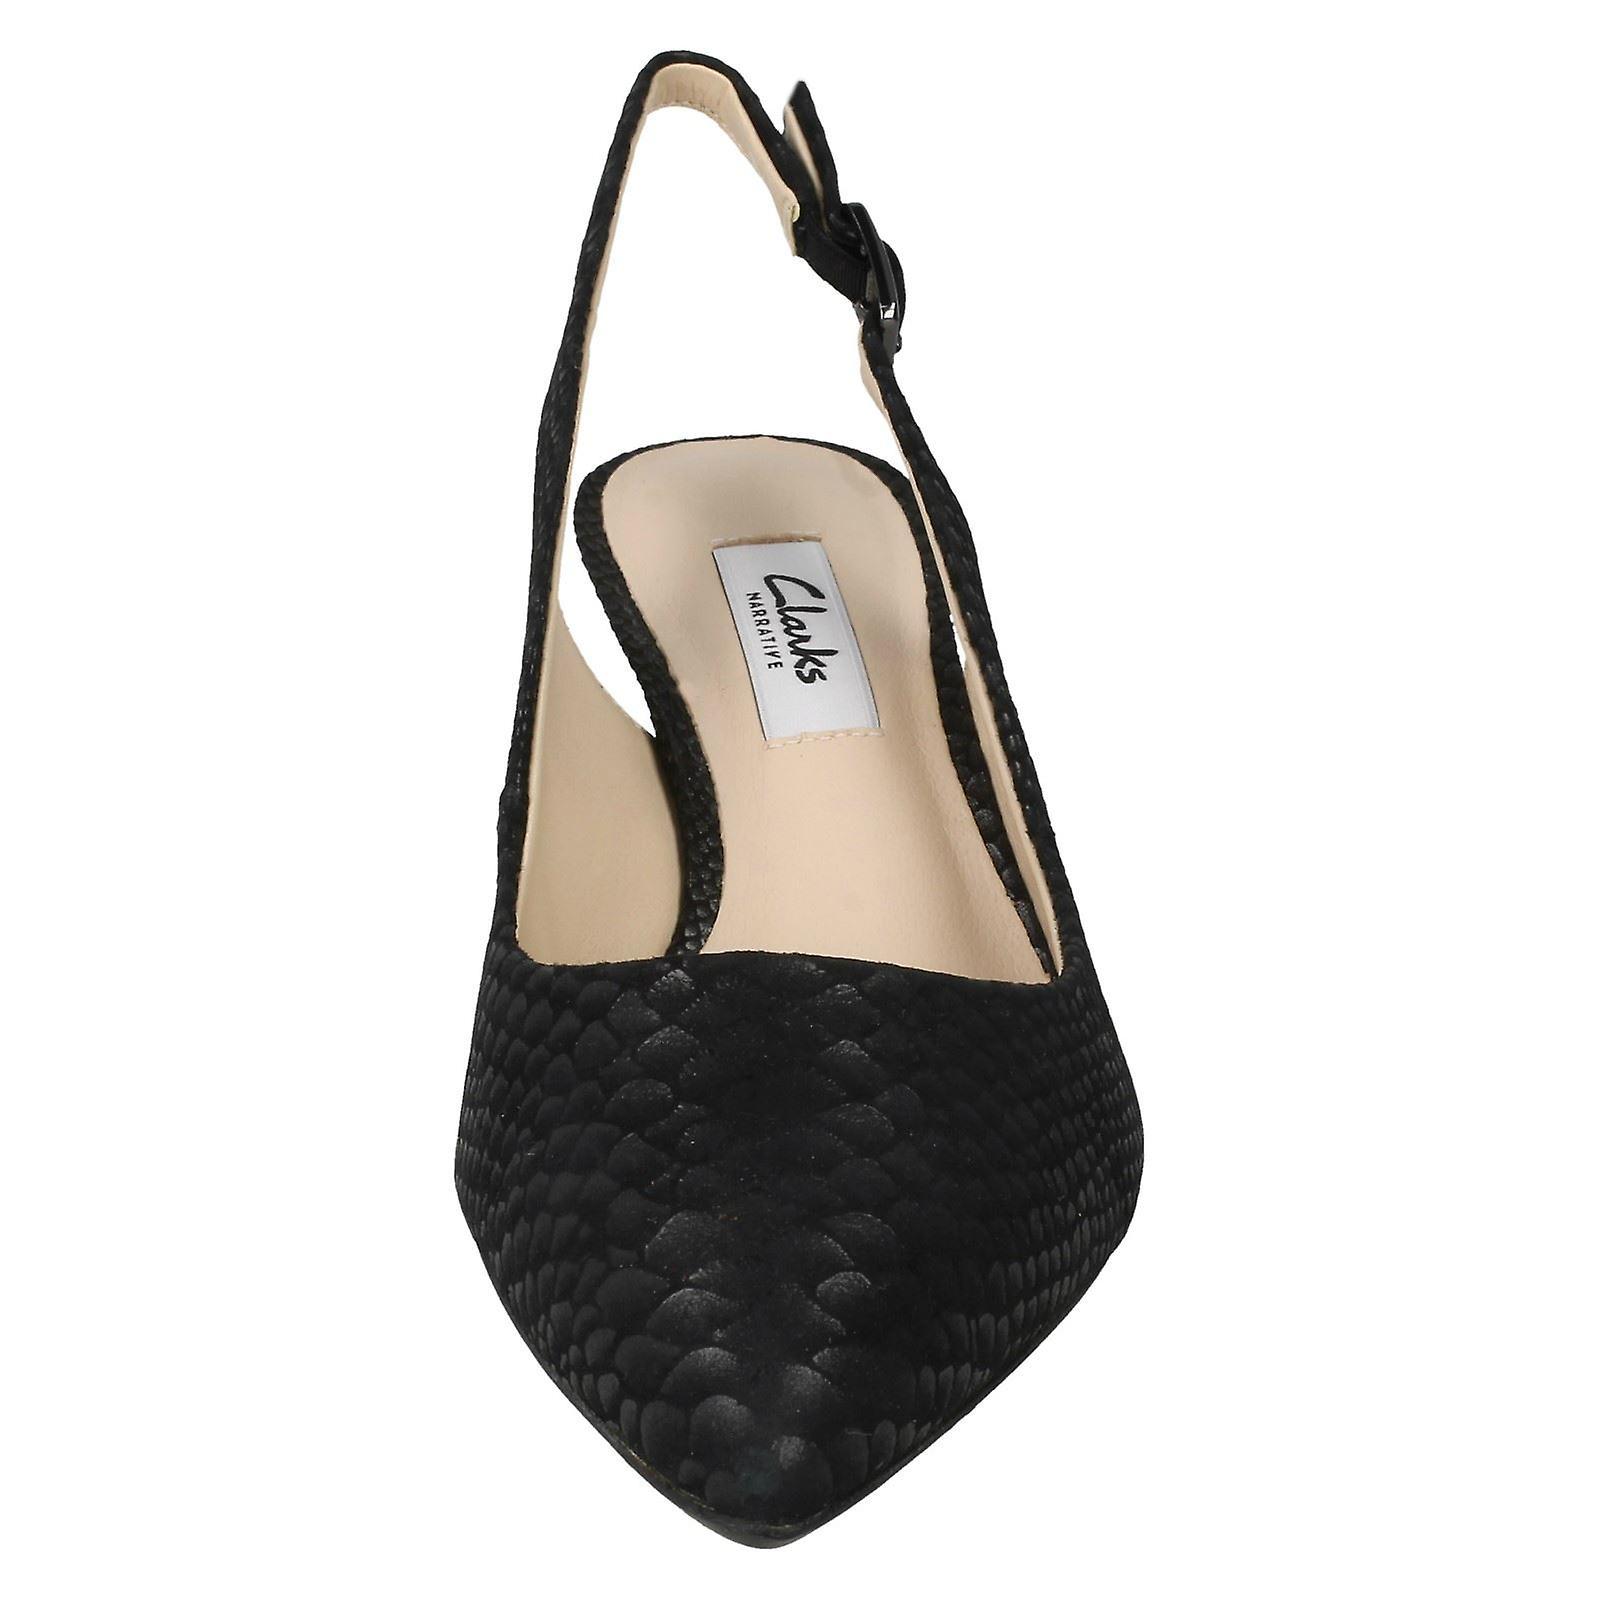 Mesdames Clarks chaton talon talon talon chaussures Smart aquifère Belle | Grand Assortiment  659205